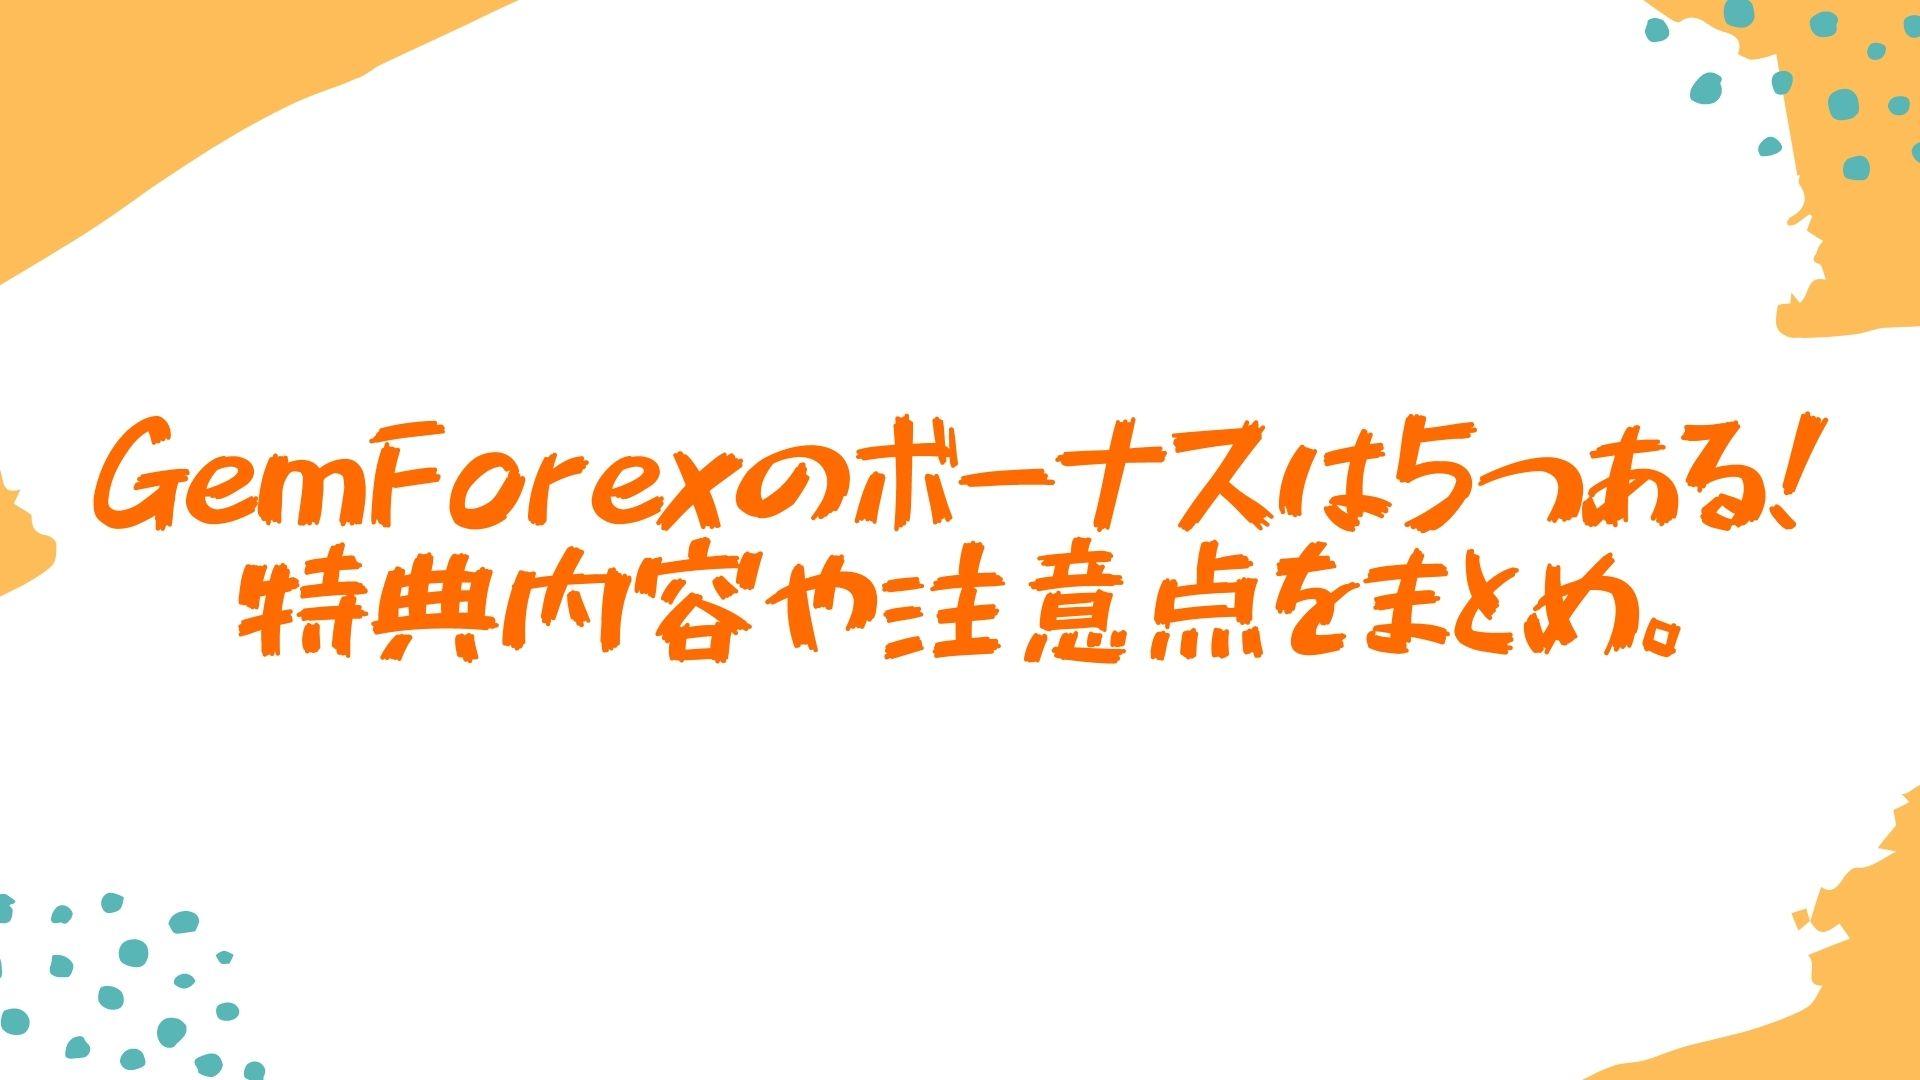 GemForexのボーナスは4つある!特典内容や注意点をまとめ。